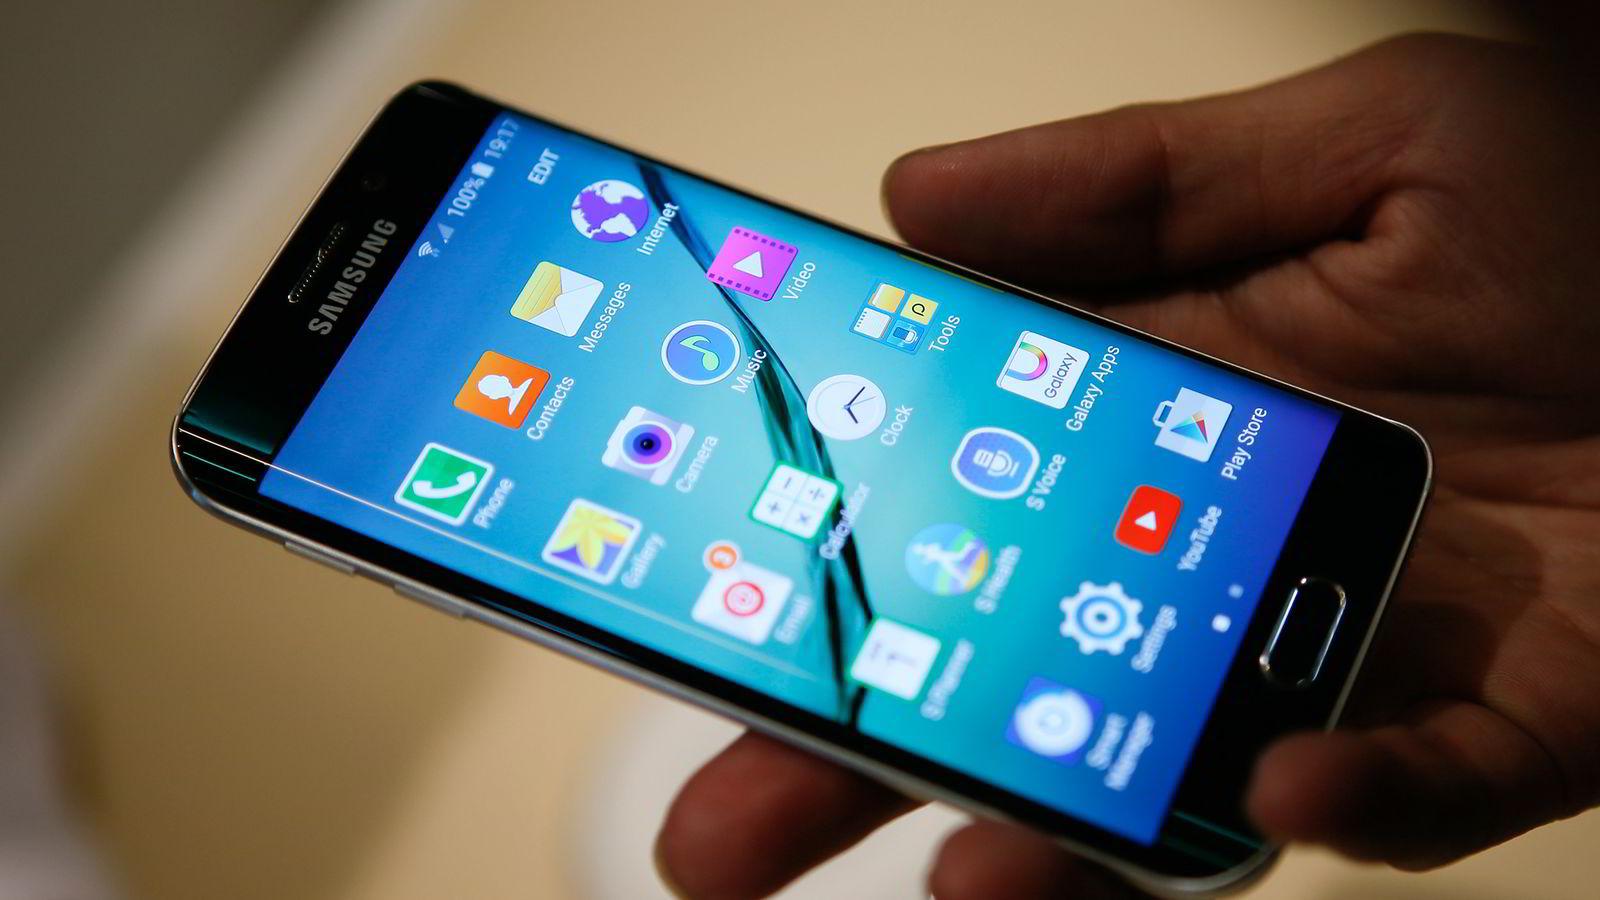 Barcelona, 1. mars 2015: Samsung Galaxy S6 edge kan erstatte betalingskort med magnetstripe slik at man kan betale med mobilen også i eldre betalingsterminaler. Foto: Albert Gea / NTB Scanpix